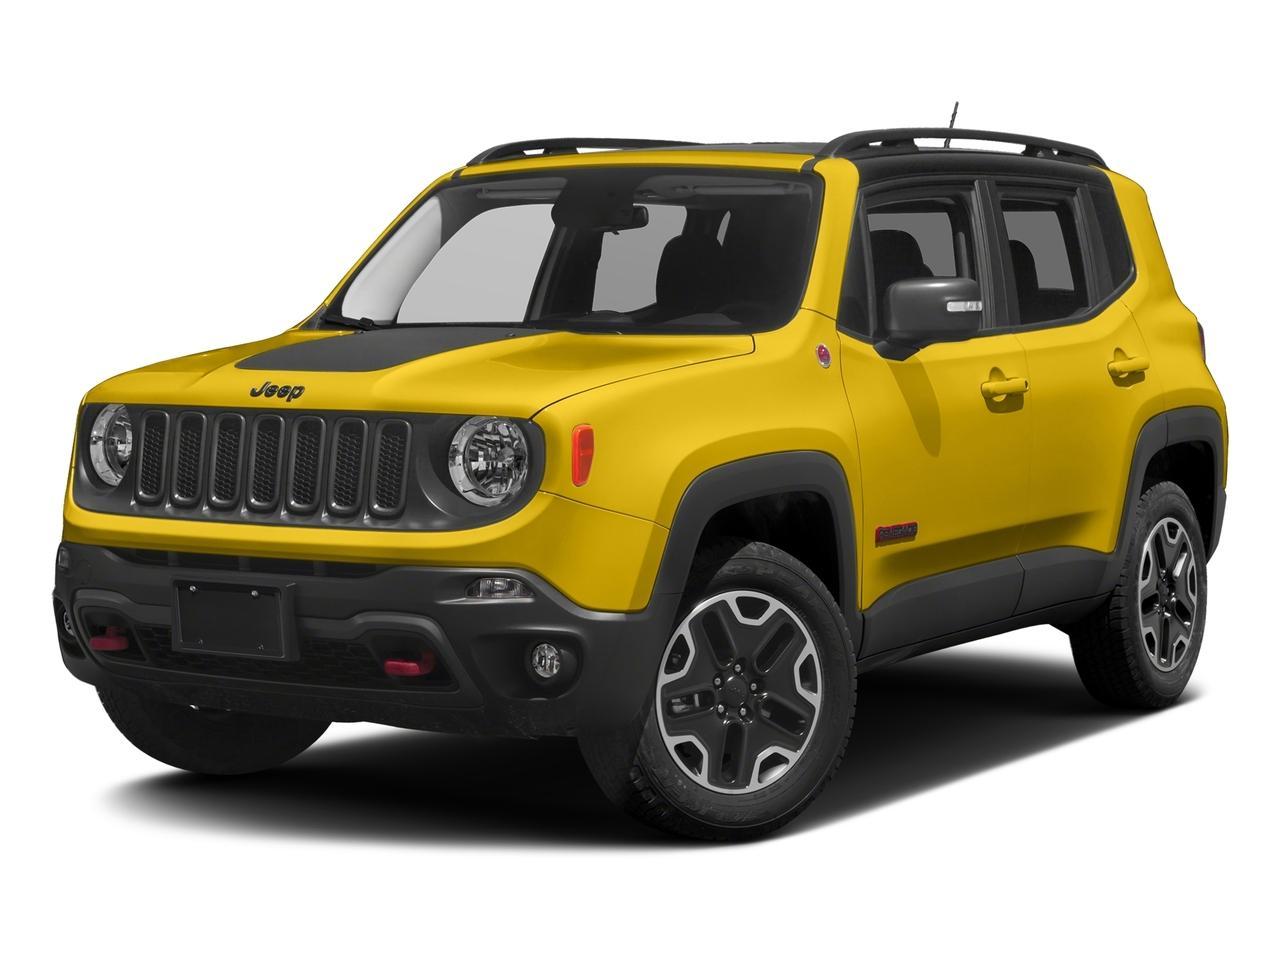 2016 Jeep Renegade Vehicle Photo in Washington, NJ 07882